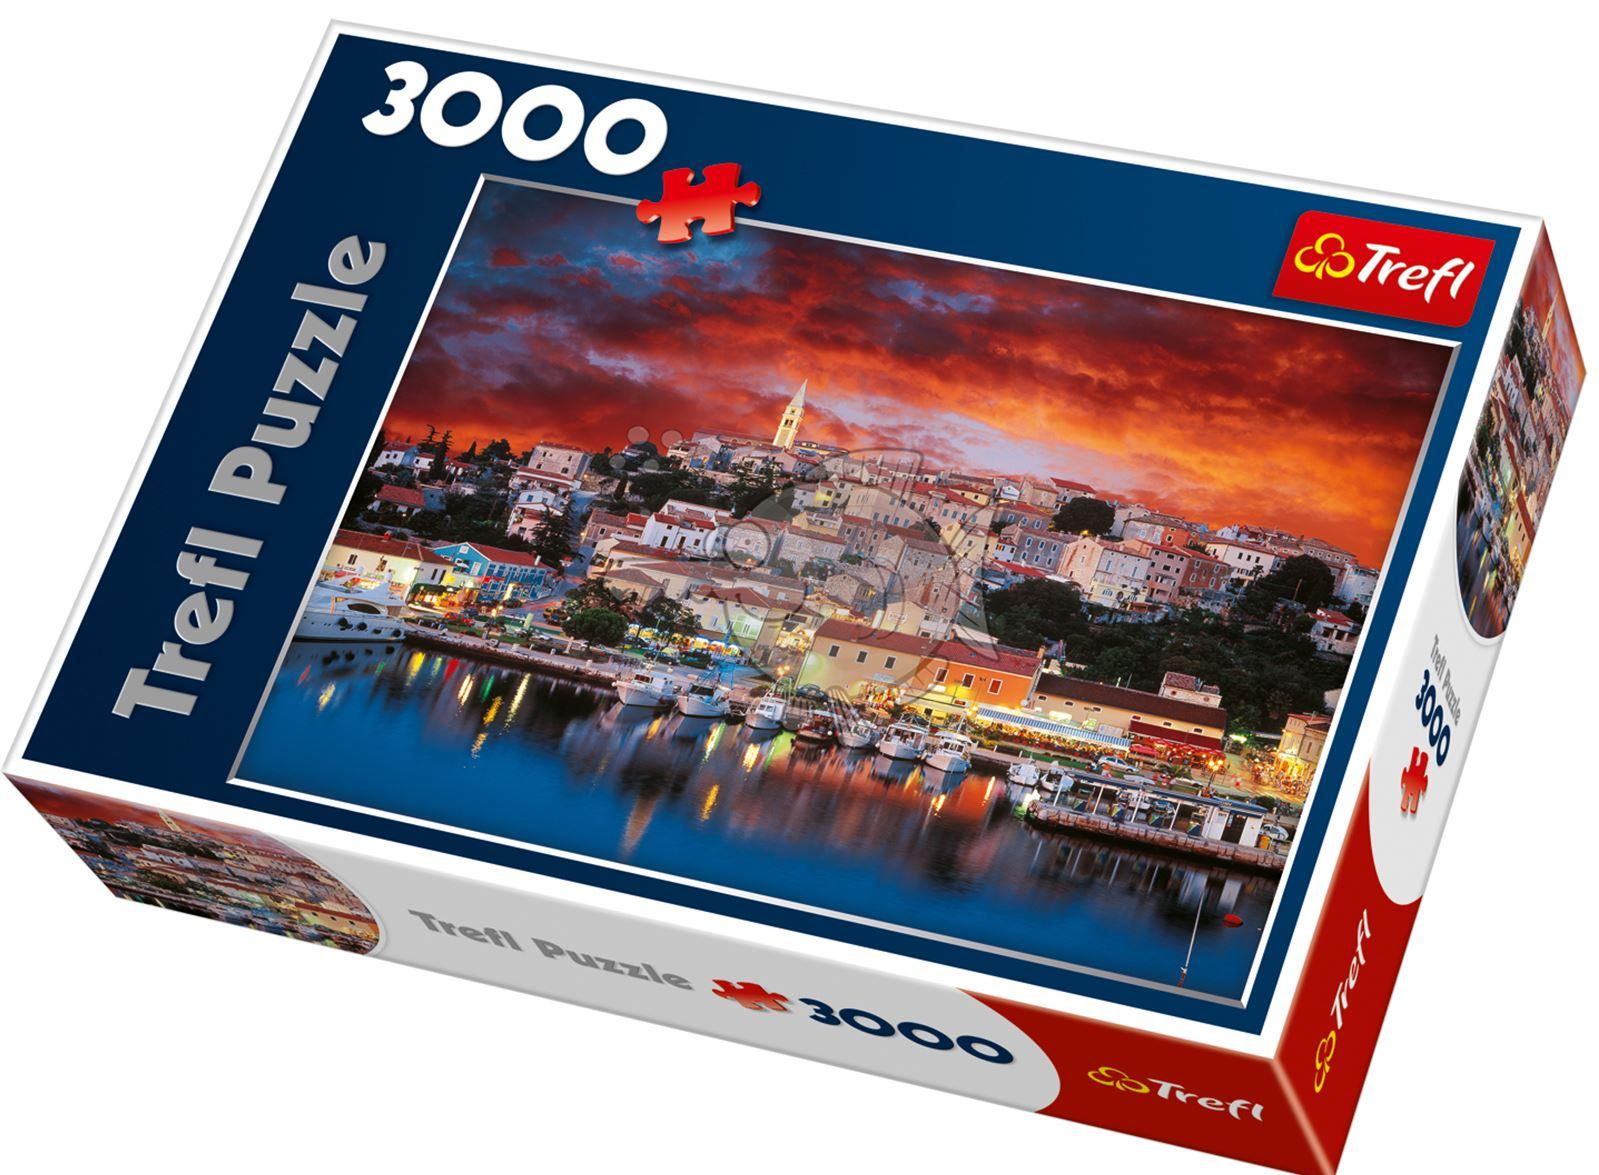 Trefl-300-500-1000-1500-2000-3000-4000-6000-Piece-Jigsaw-Puzzle-Landscapes-City thumbnail 451